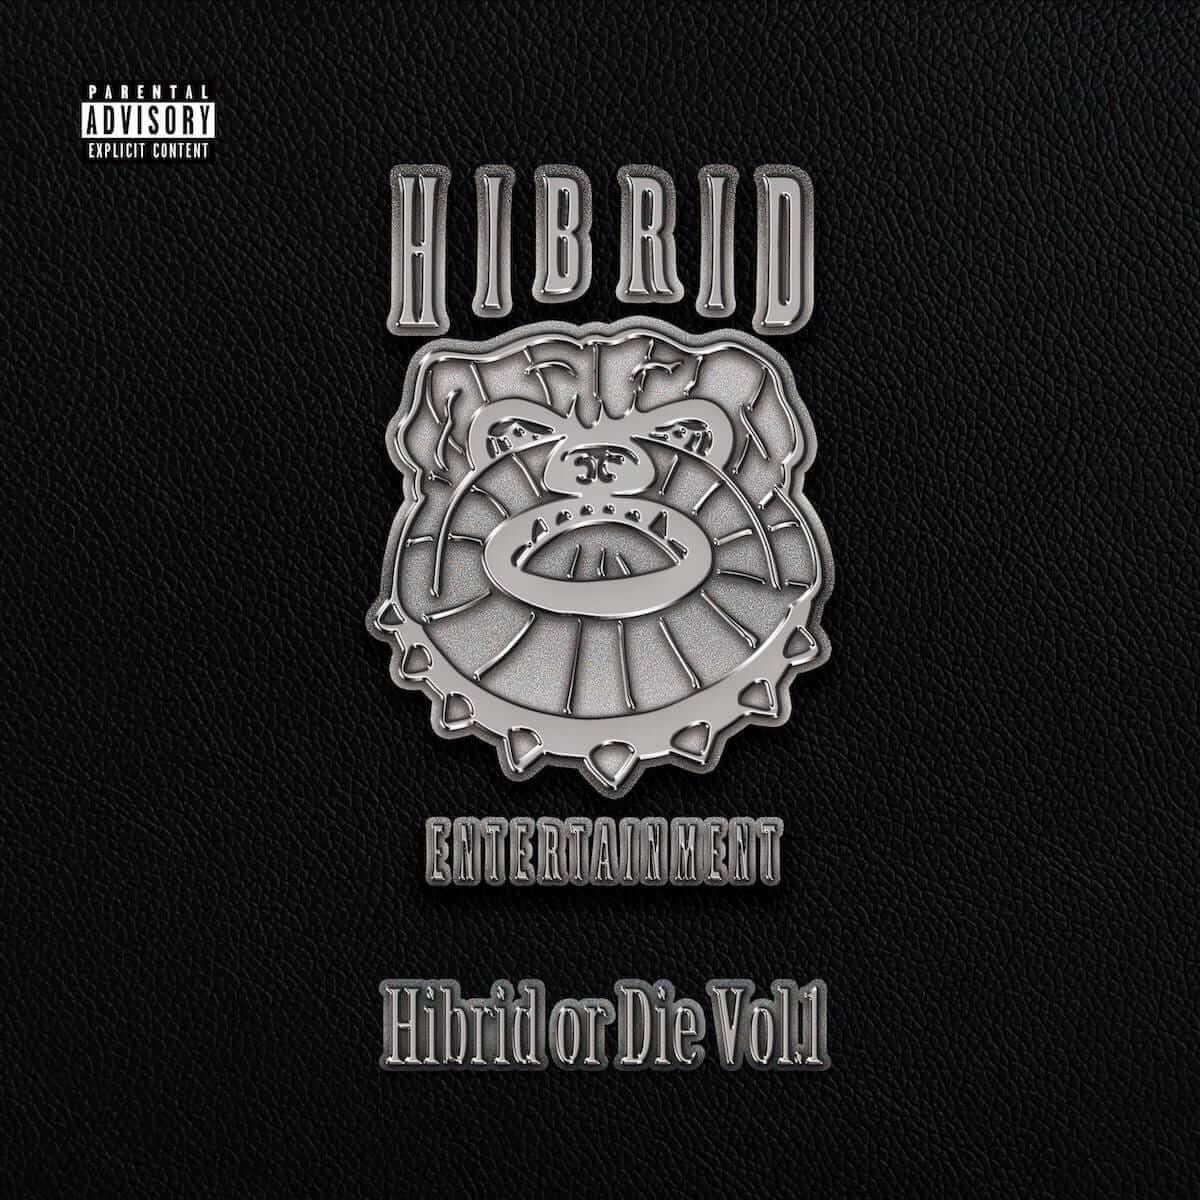 Jin Dogg、Young Yujiro、DJ BULLSETら所属のHIBRID ENTERTAINMENTが初のオフィシャル・アルバムを9月リリース music180801-hibrident-2-1200x1200